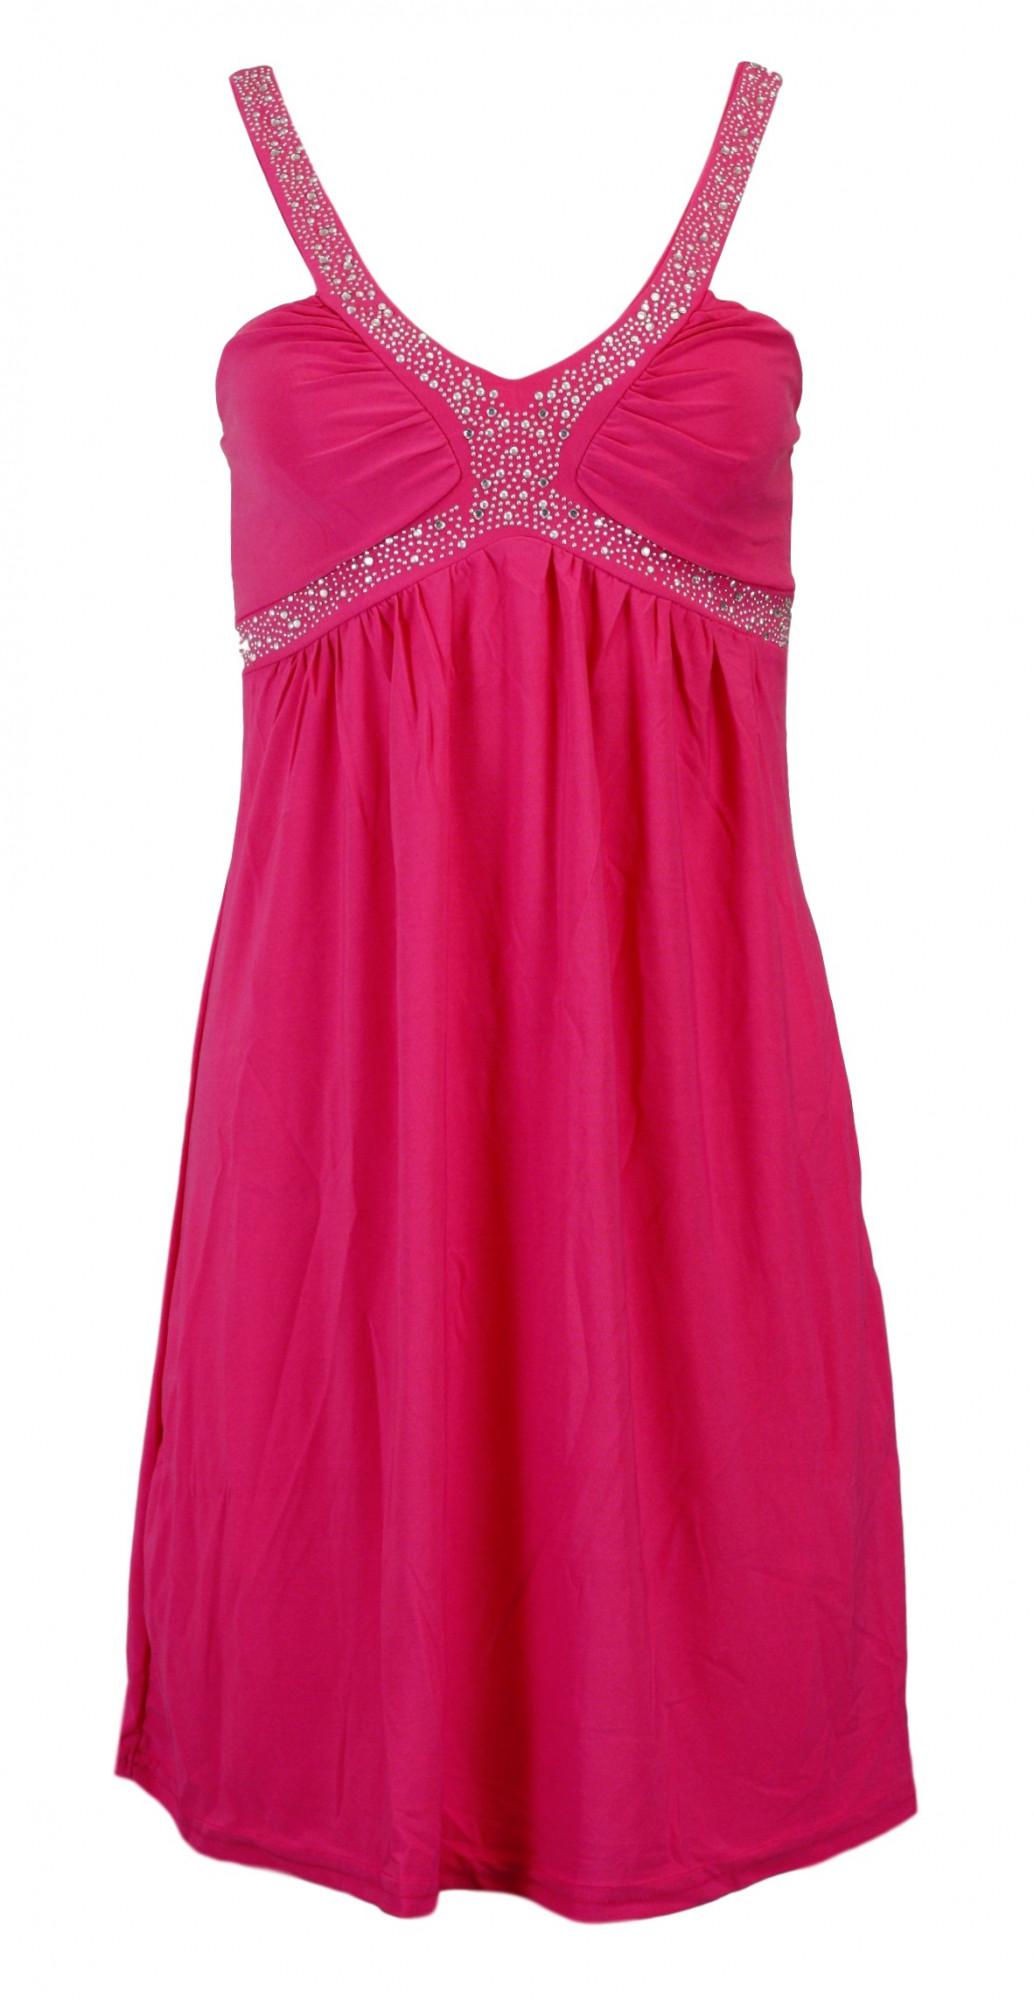 Dámské šaty In-Stylefashion 5336 - Gemini Barva: fuchsia, Velikost: XS